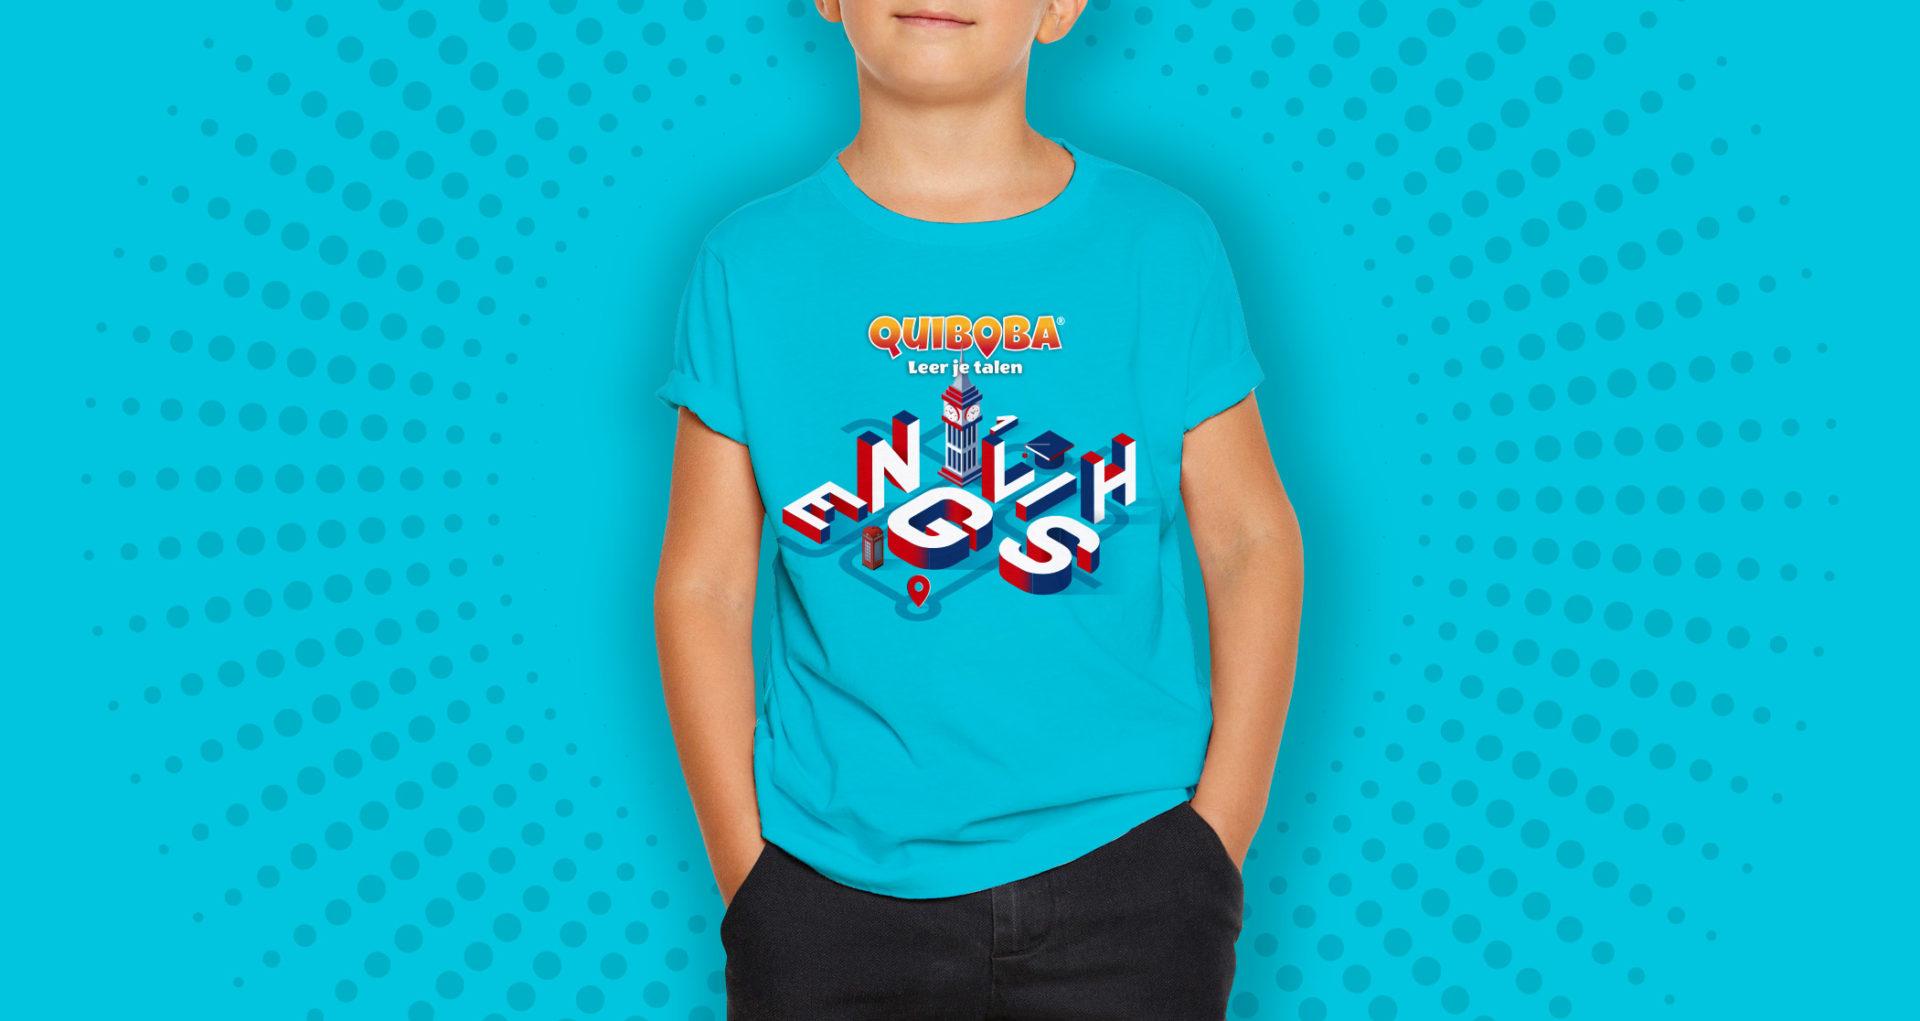 Taalspel T-Shirt - Rene Verkaart)